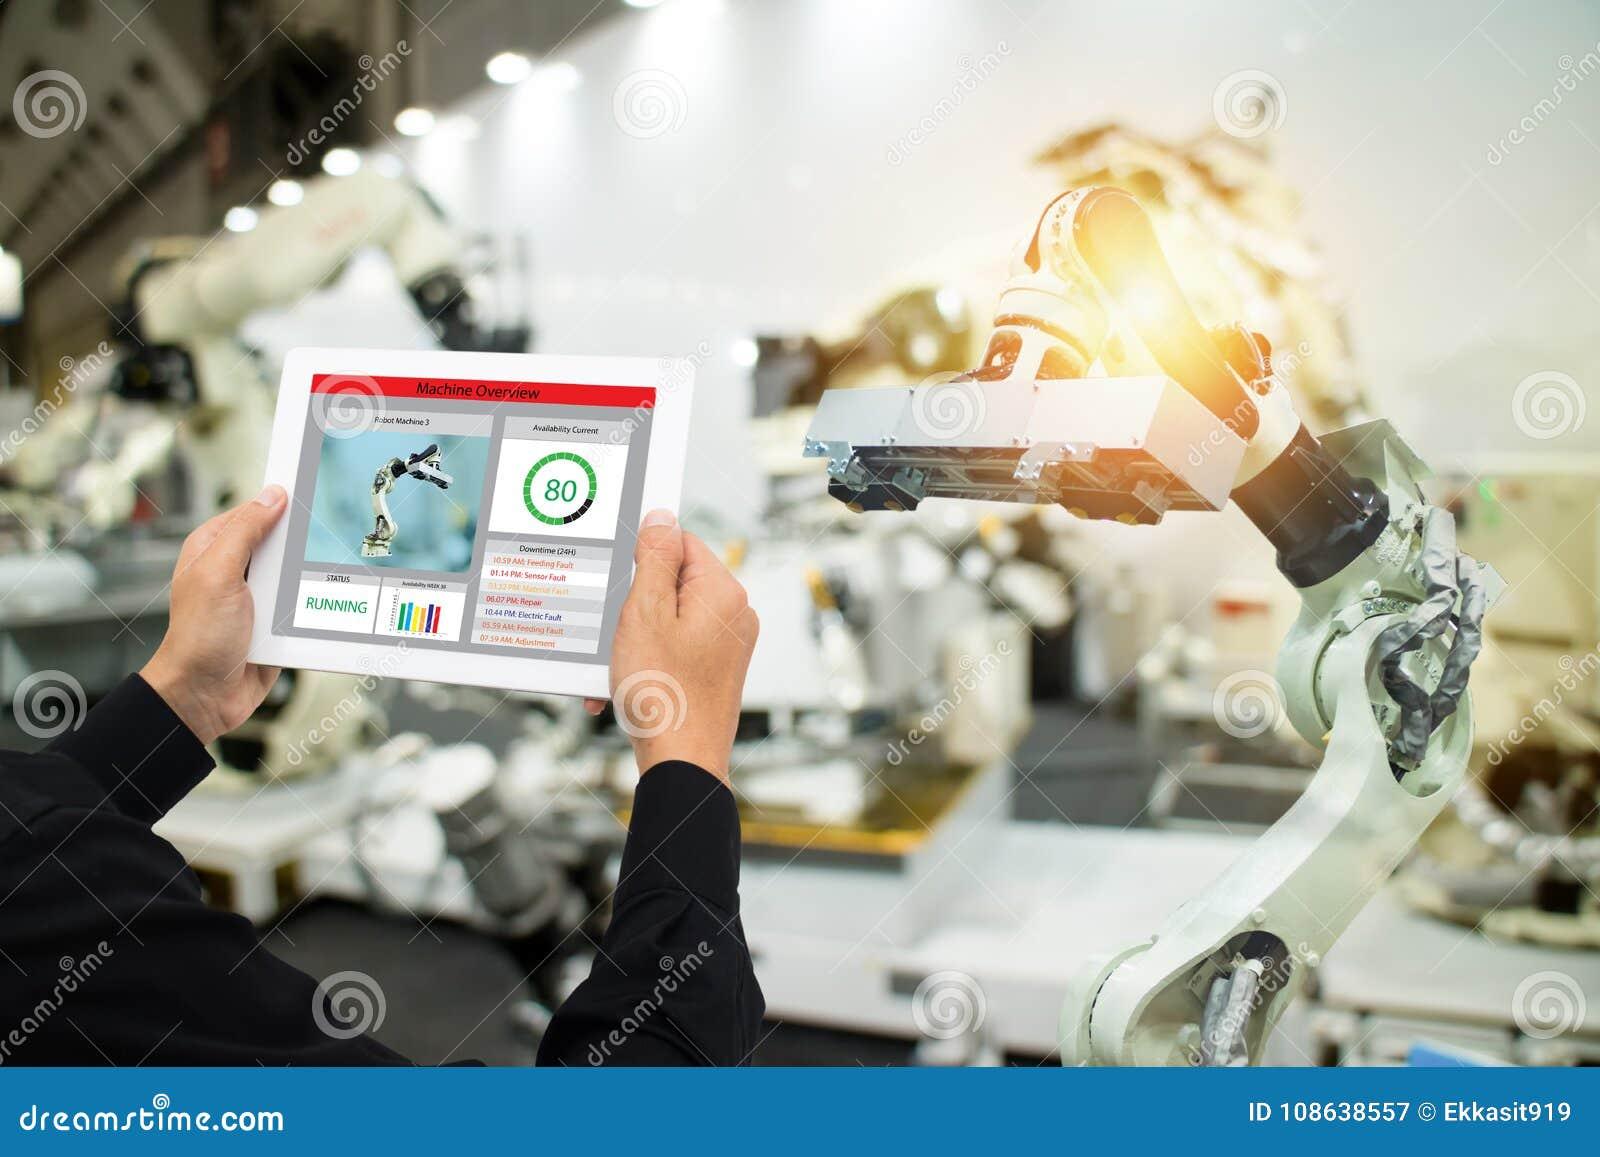 Iot产业4 0个概念,使用软件被增添,在片剂的虚拟现实的工业工程师对监测在真正的t的机器